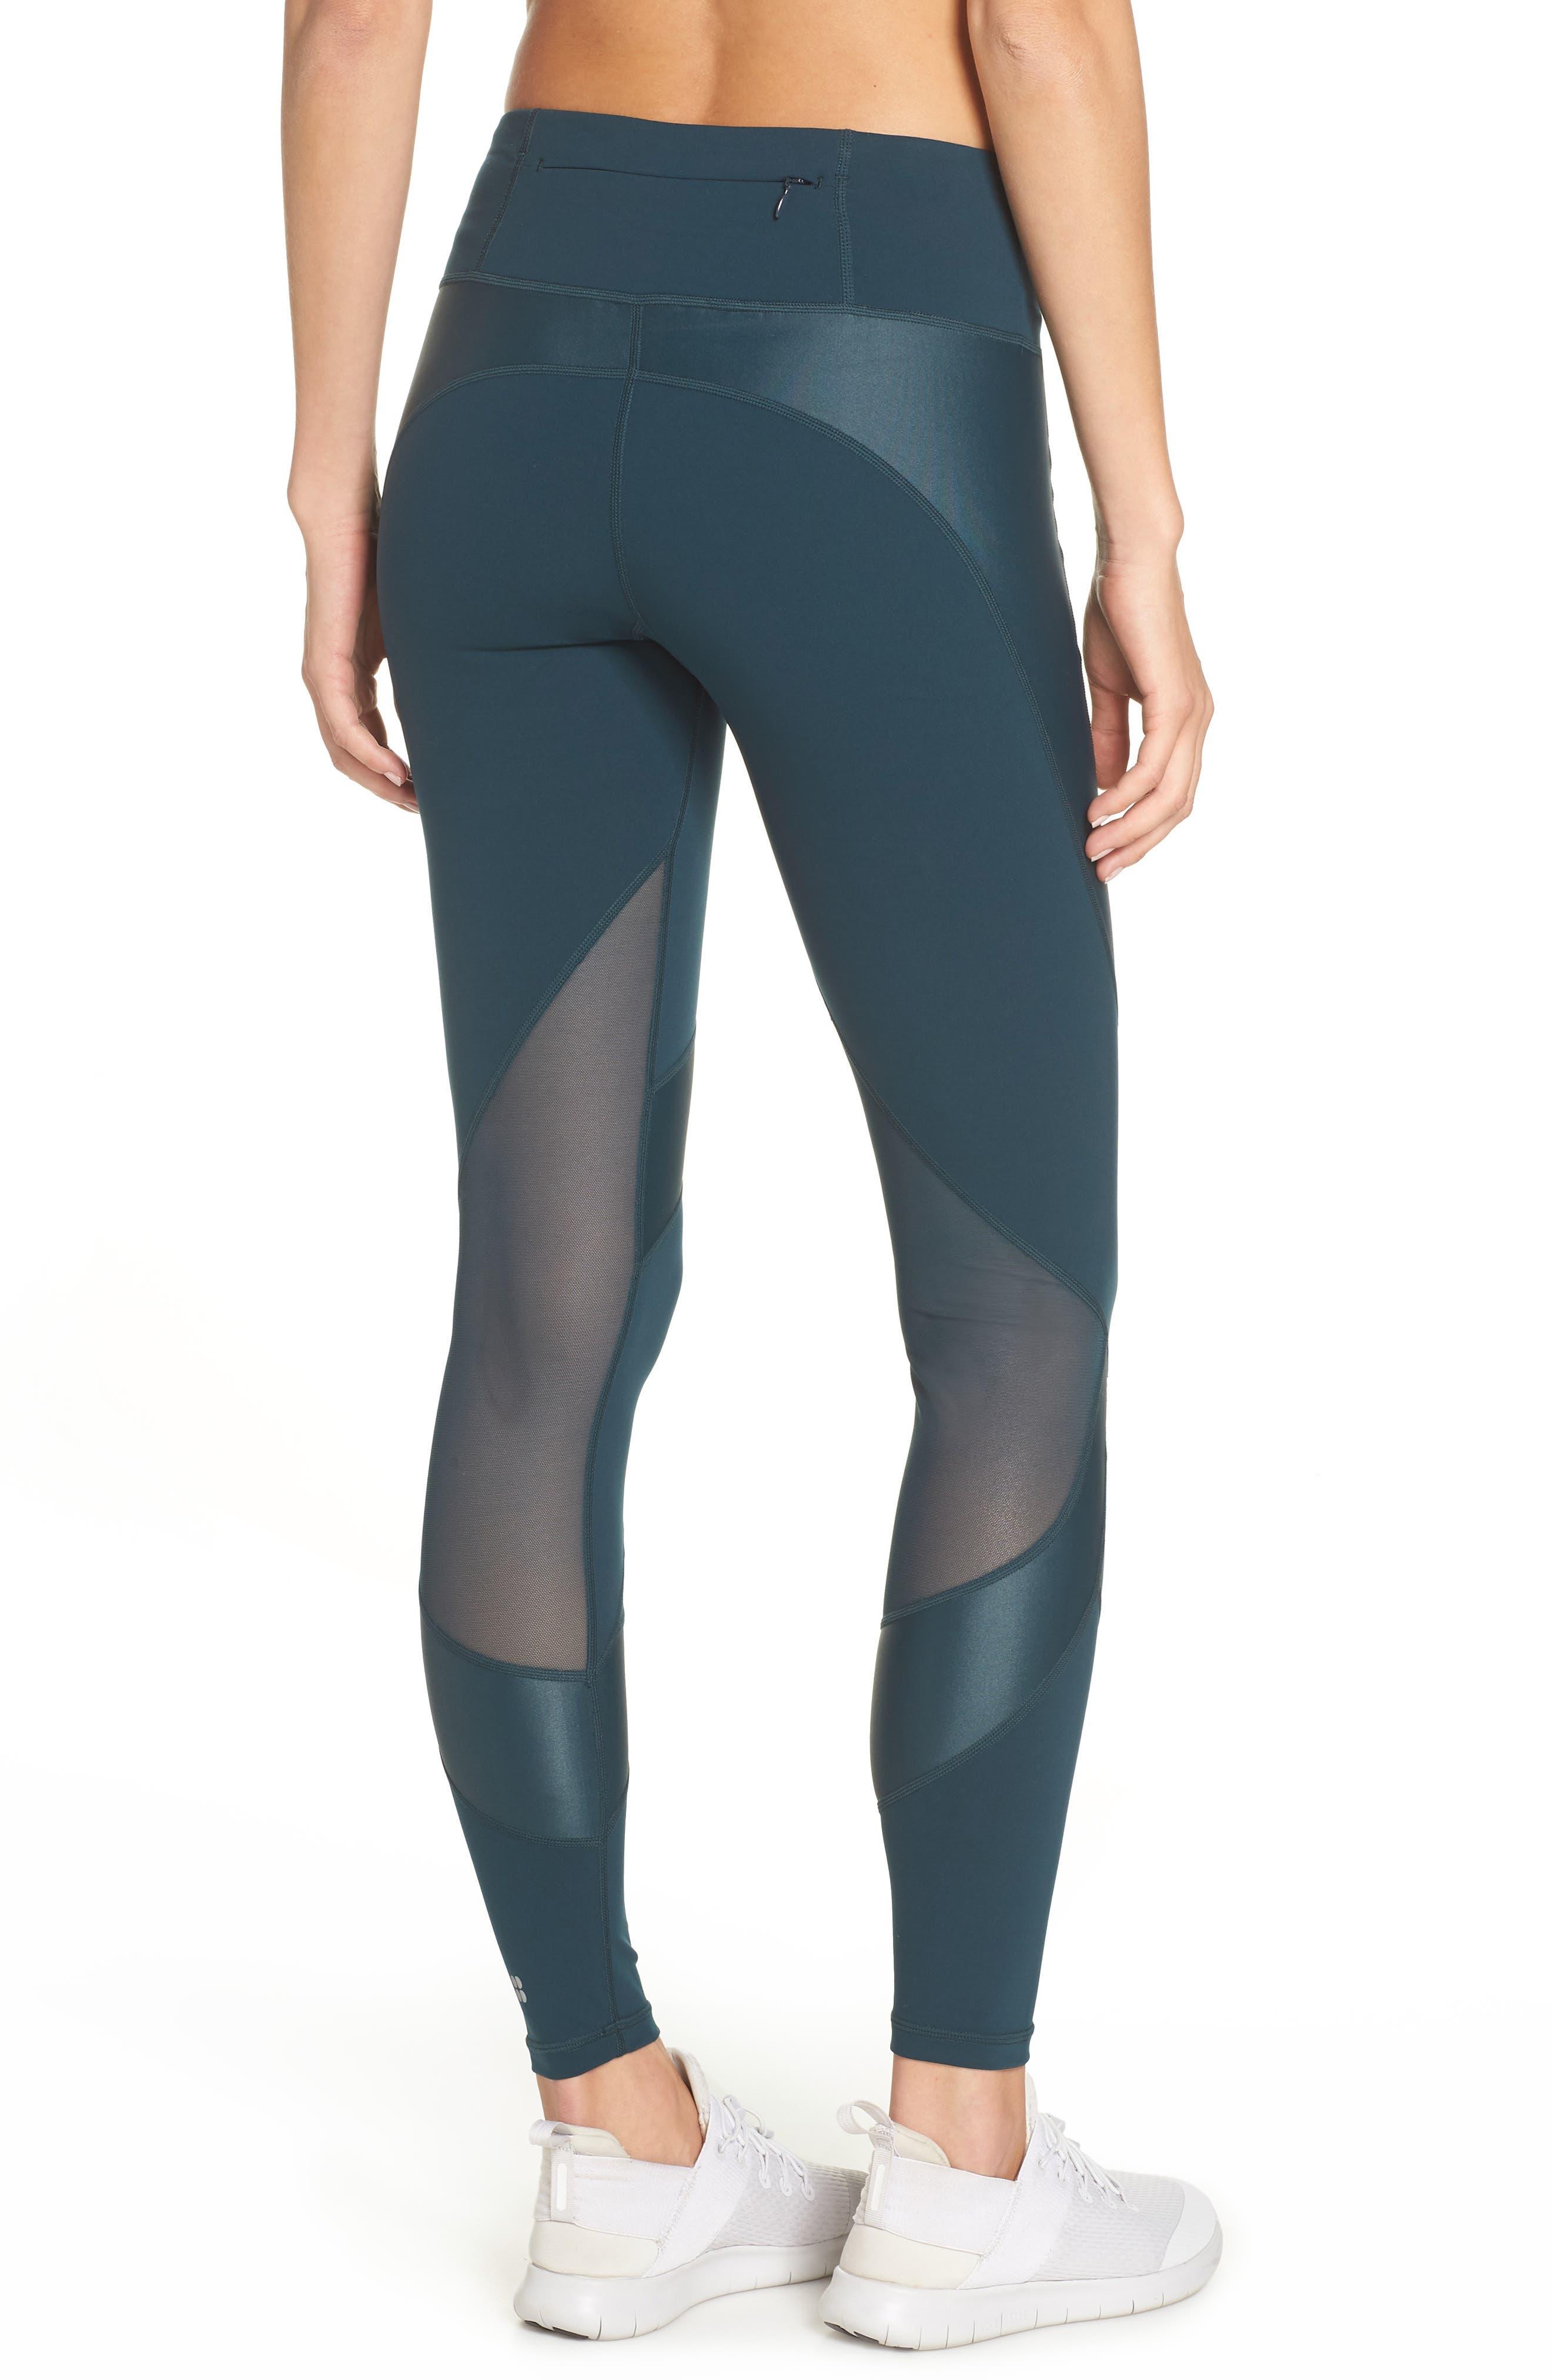 Power Wetlook Mesh Workout Leggings,                             Alternate thumbnail 2, color,                             MIDNIGHT TEAL